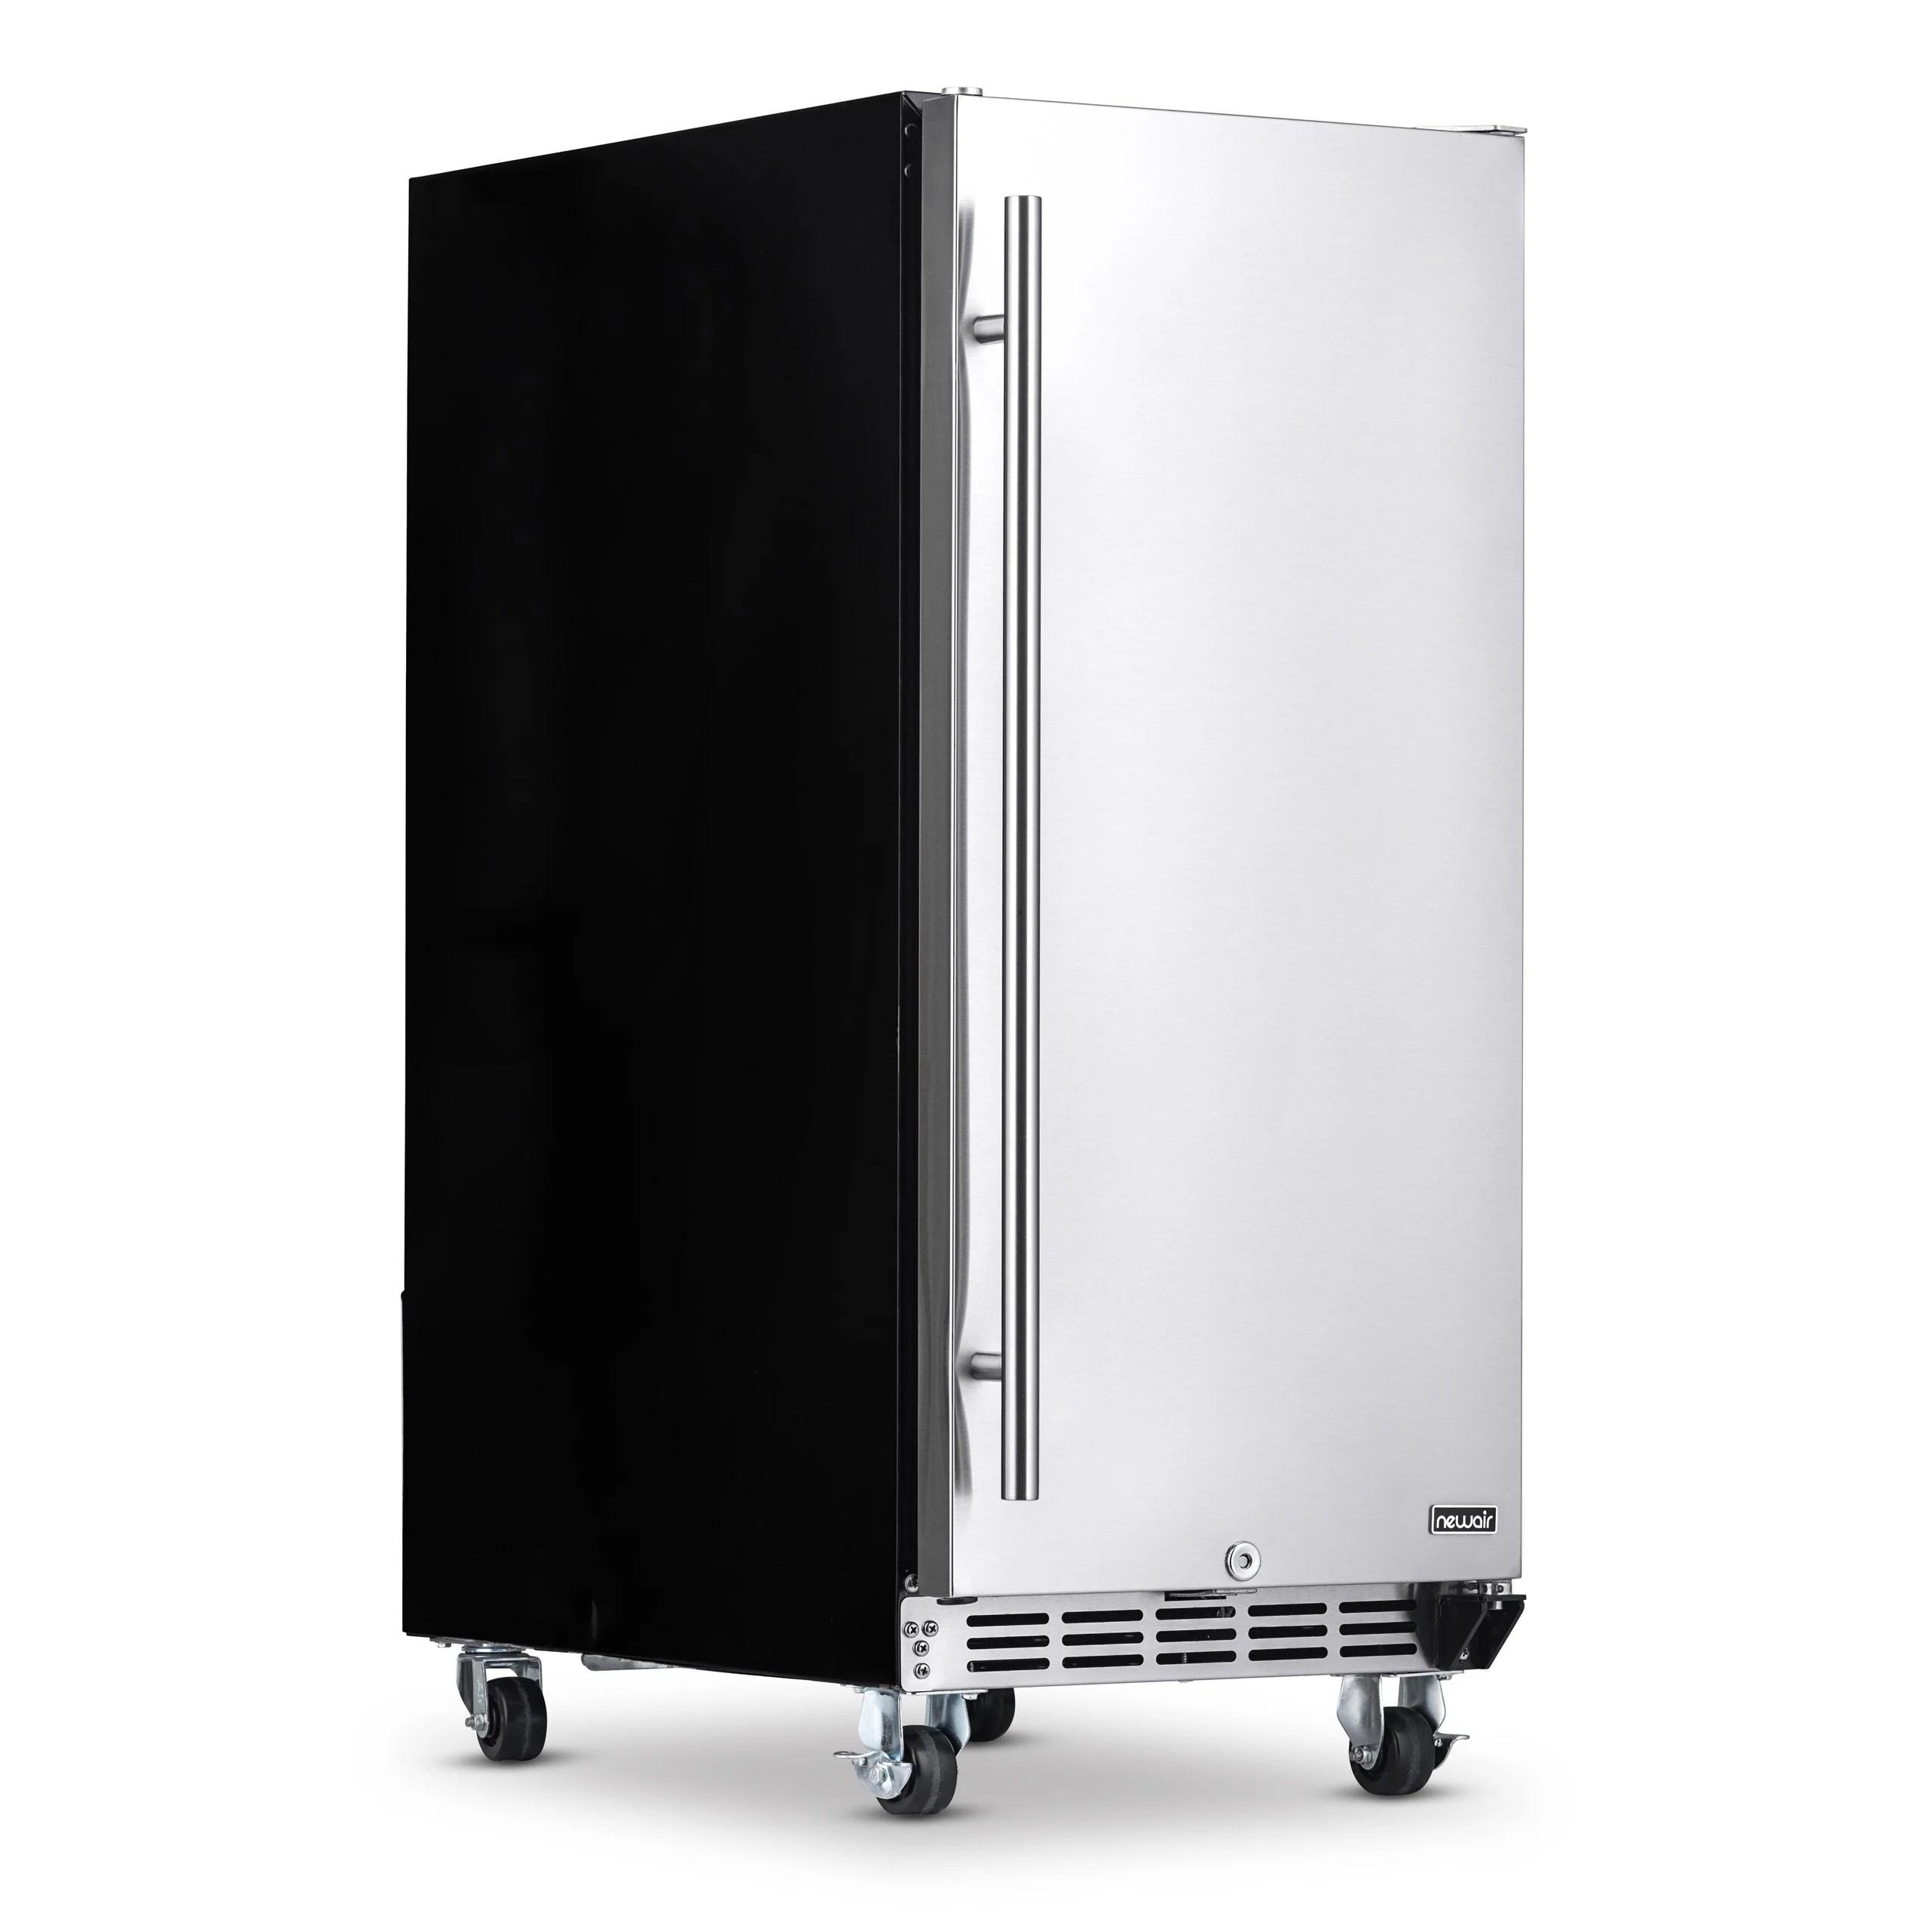 newair premium built in outdoor refrigerator 90 can storage beverage cooler center fridge for patio stainless steel